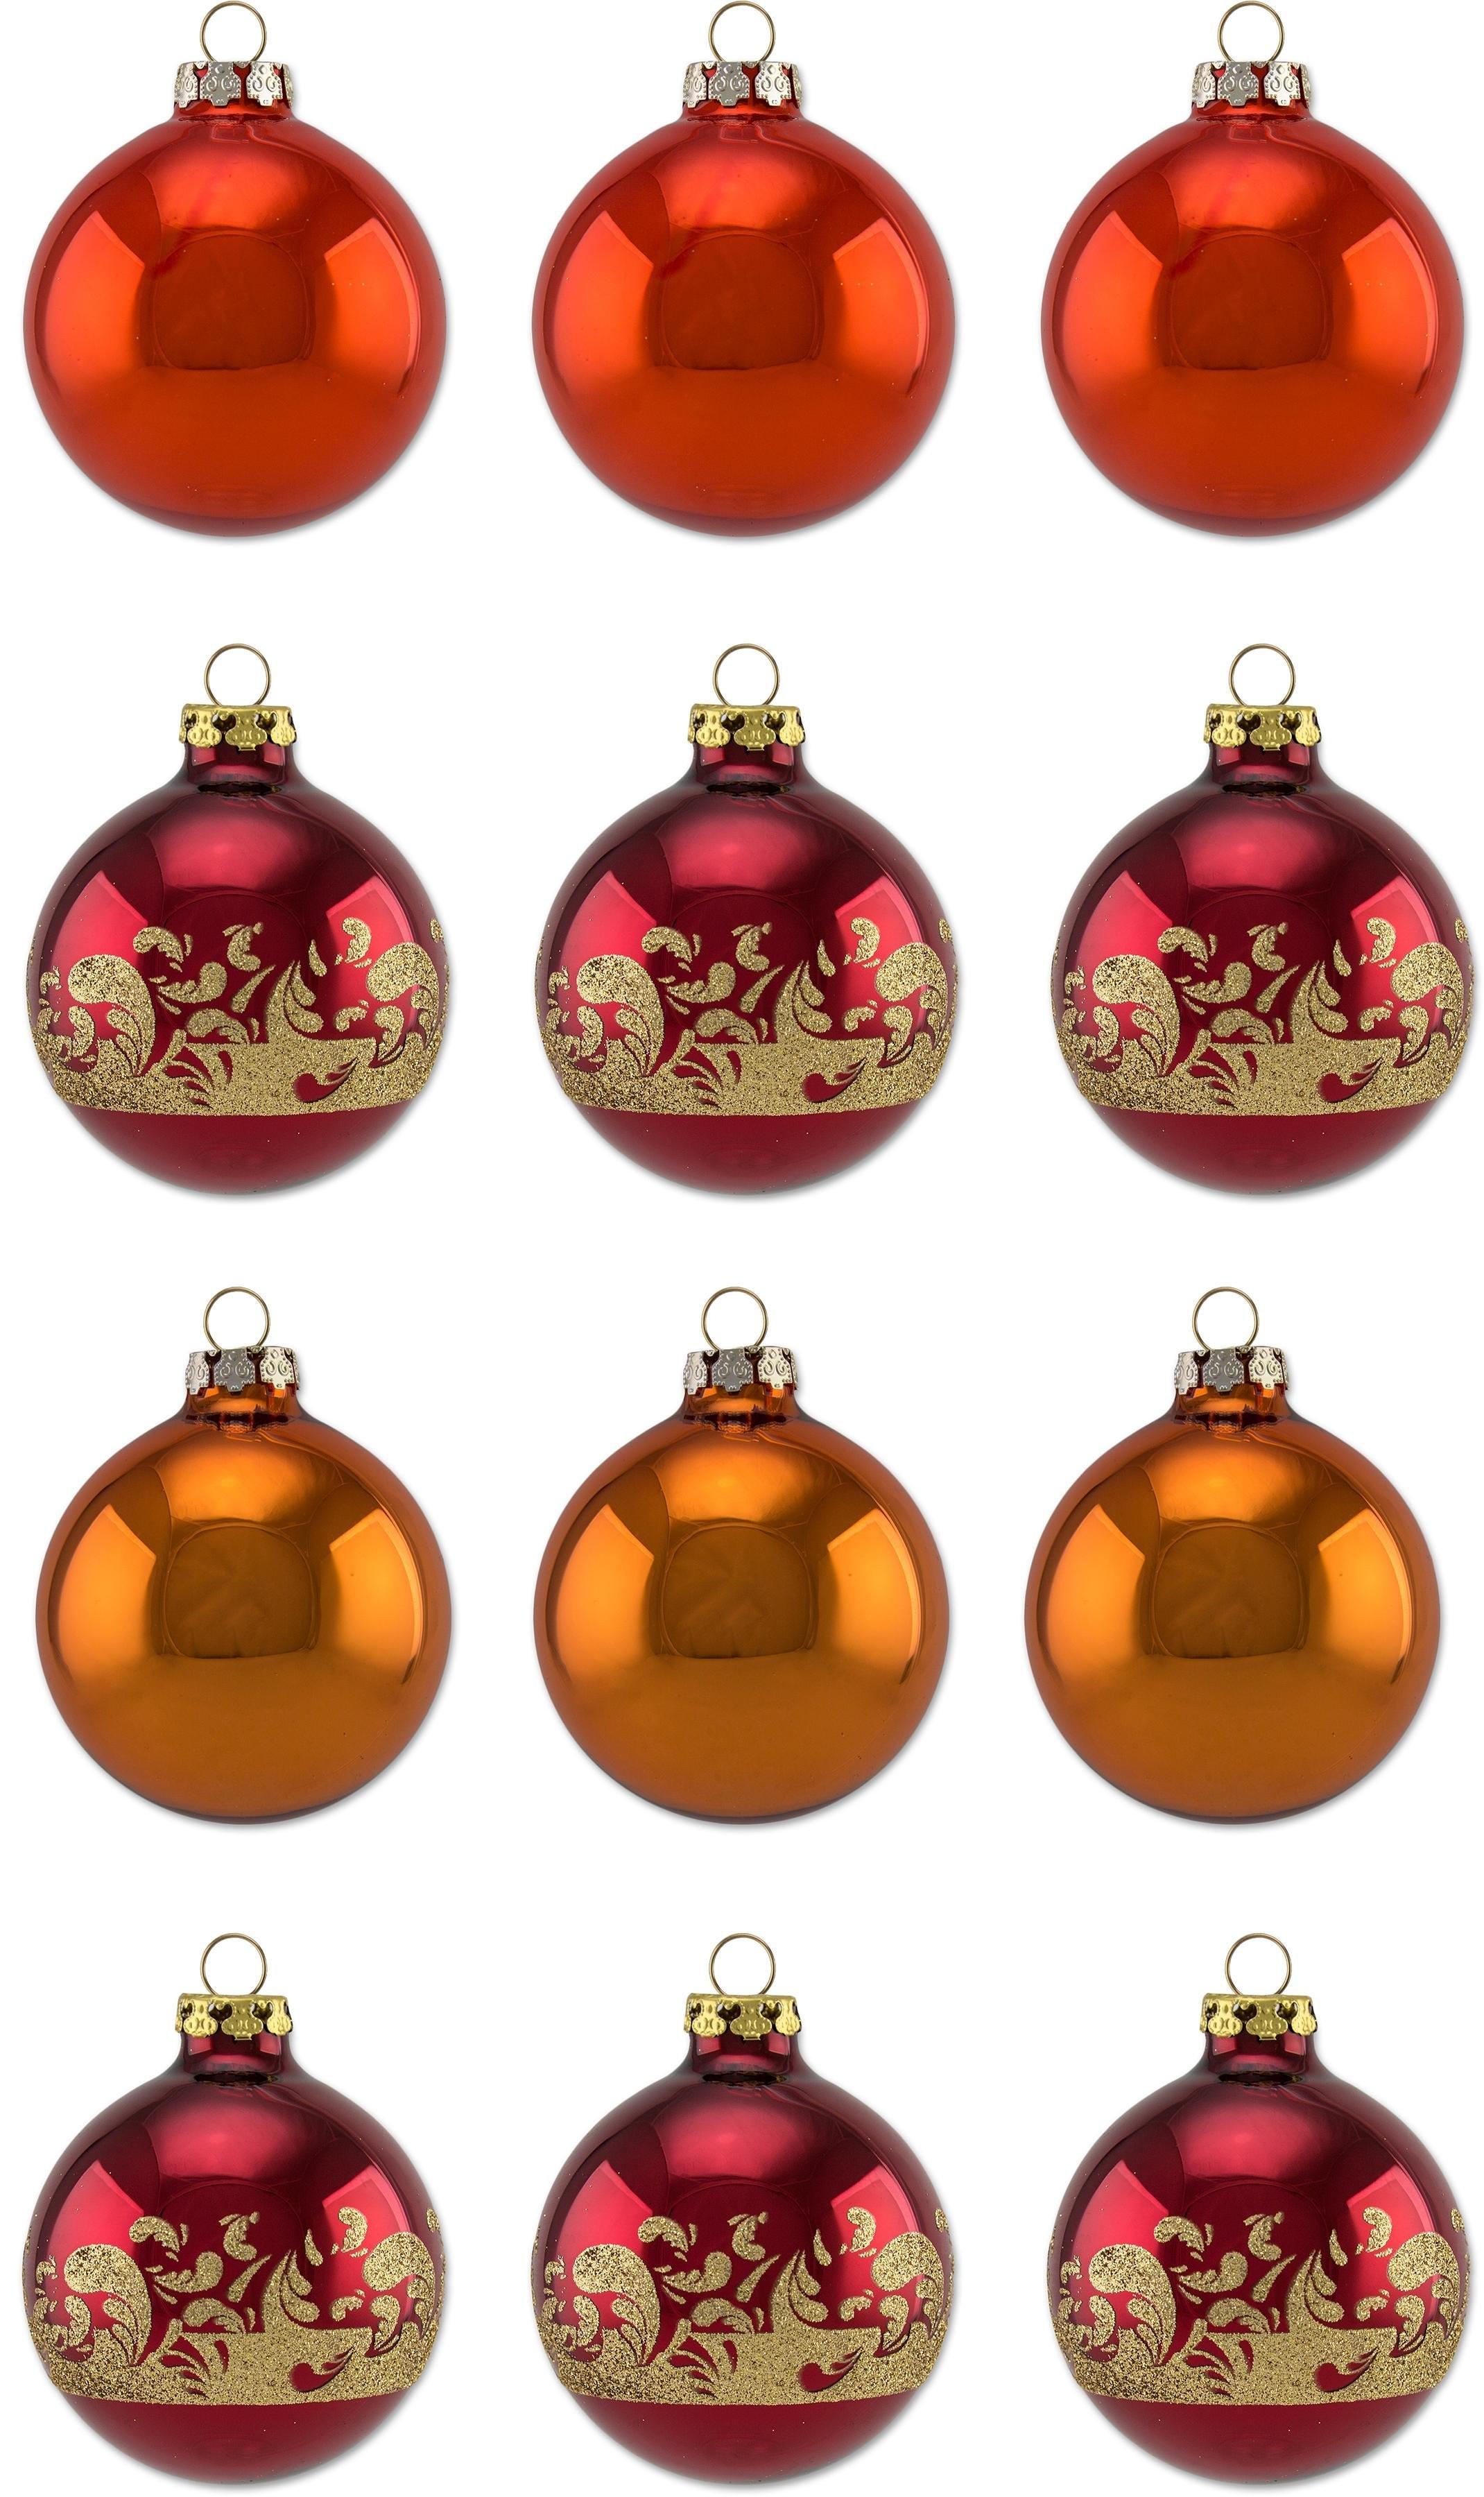 Thüringer Glasdesign kerstbal voordelig en veilig online kopen